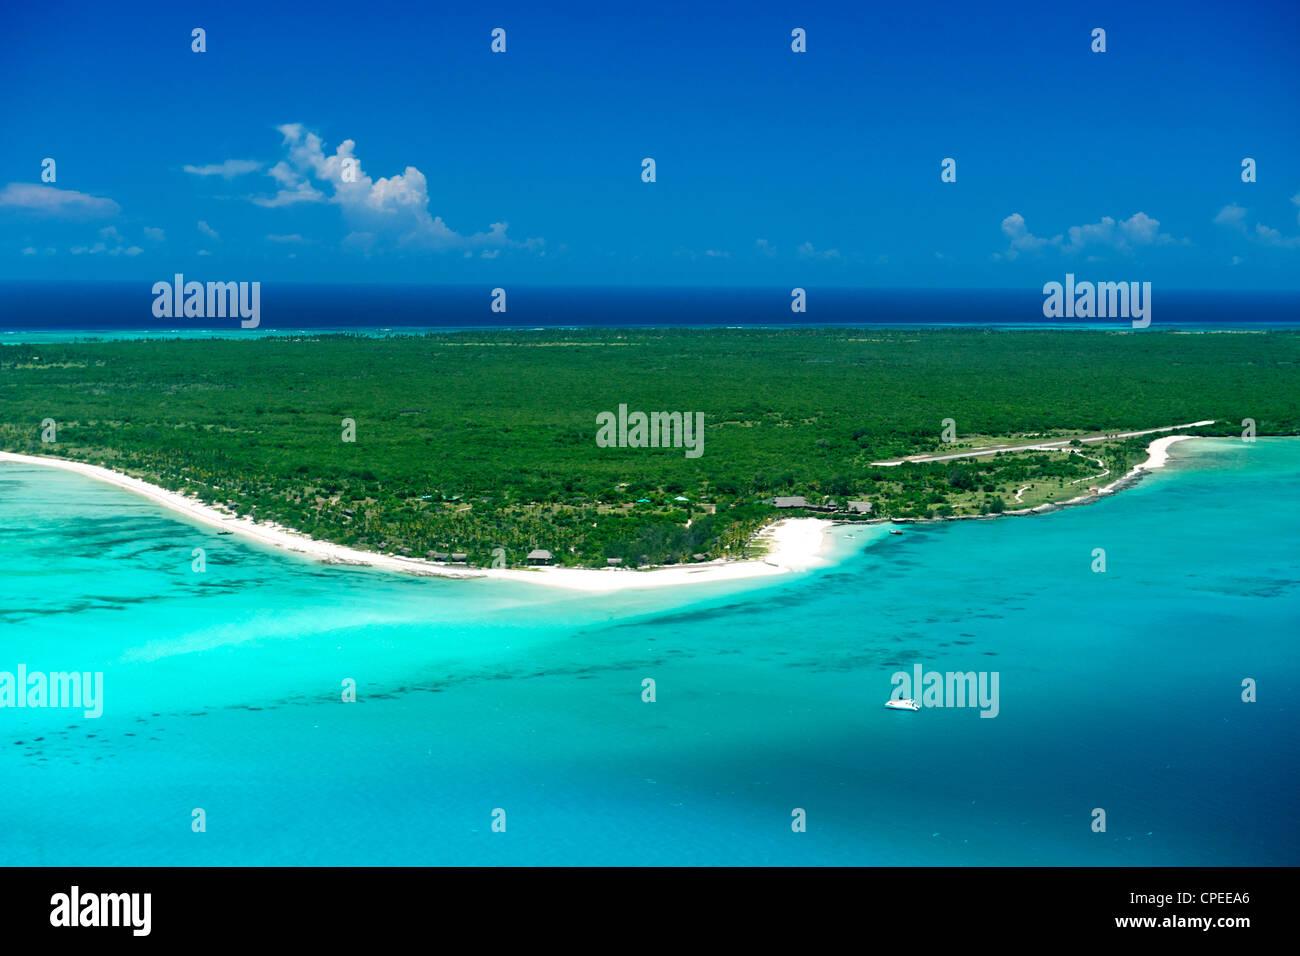 Matemo island in the Quirimbas archipelago off the coast of Mozambique. - Stock Image